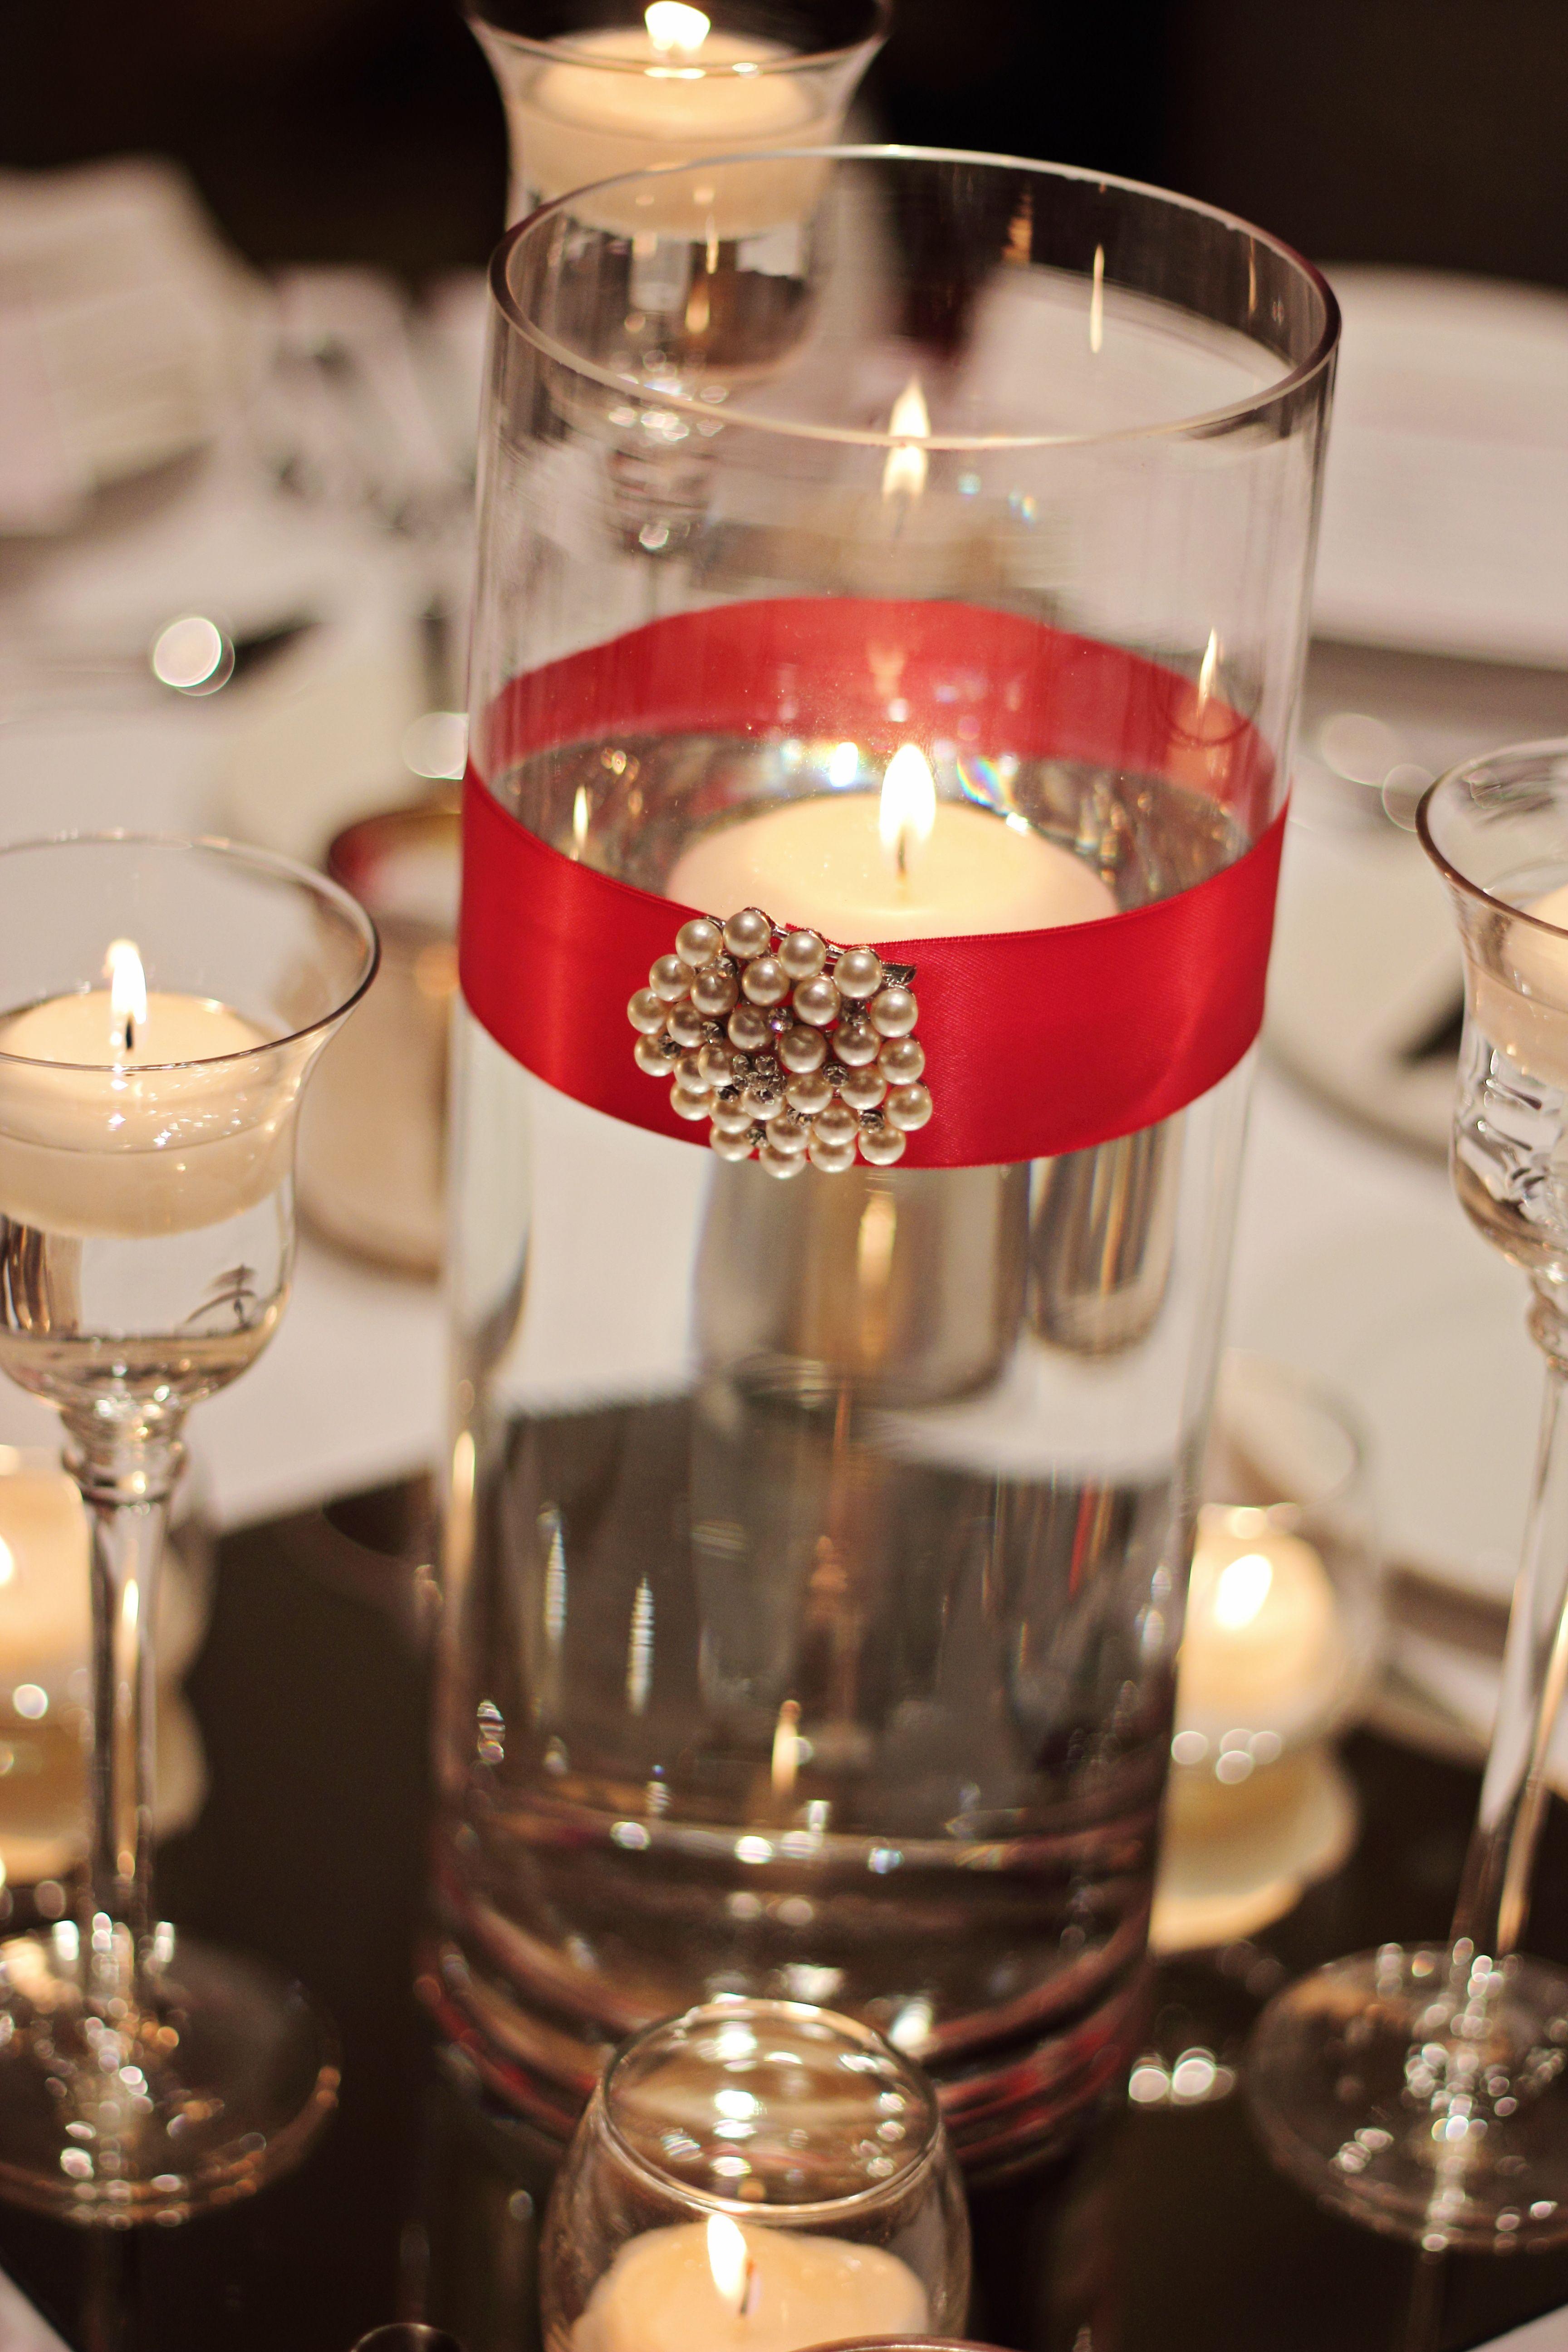 Wedding decorations red  Candle centerpiece  b u l wedding ideas  Pinterest  Centerpieces